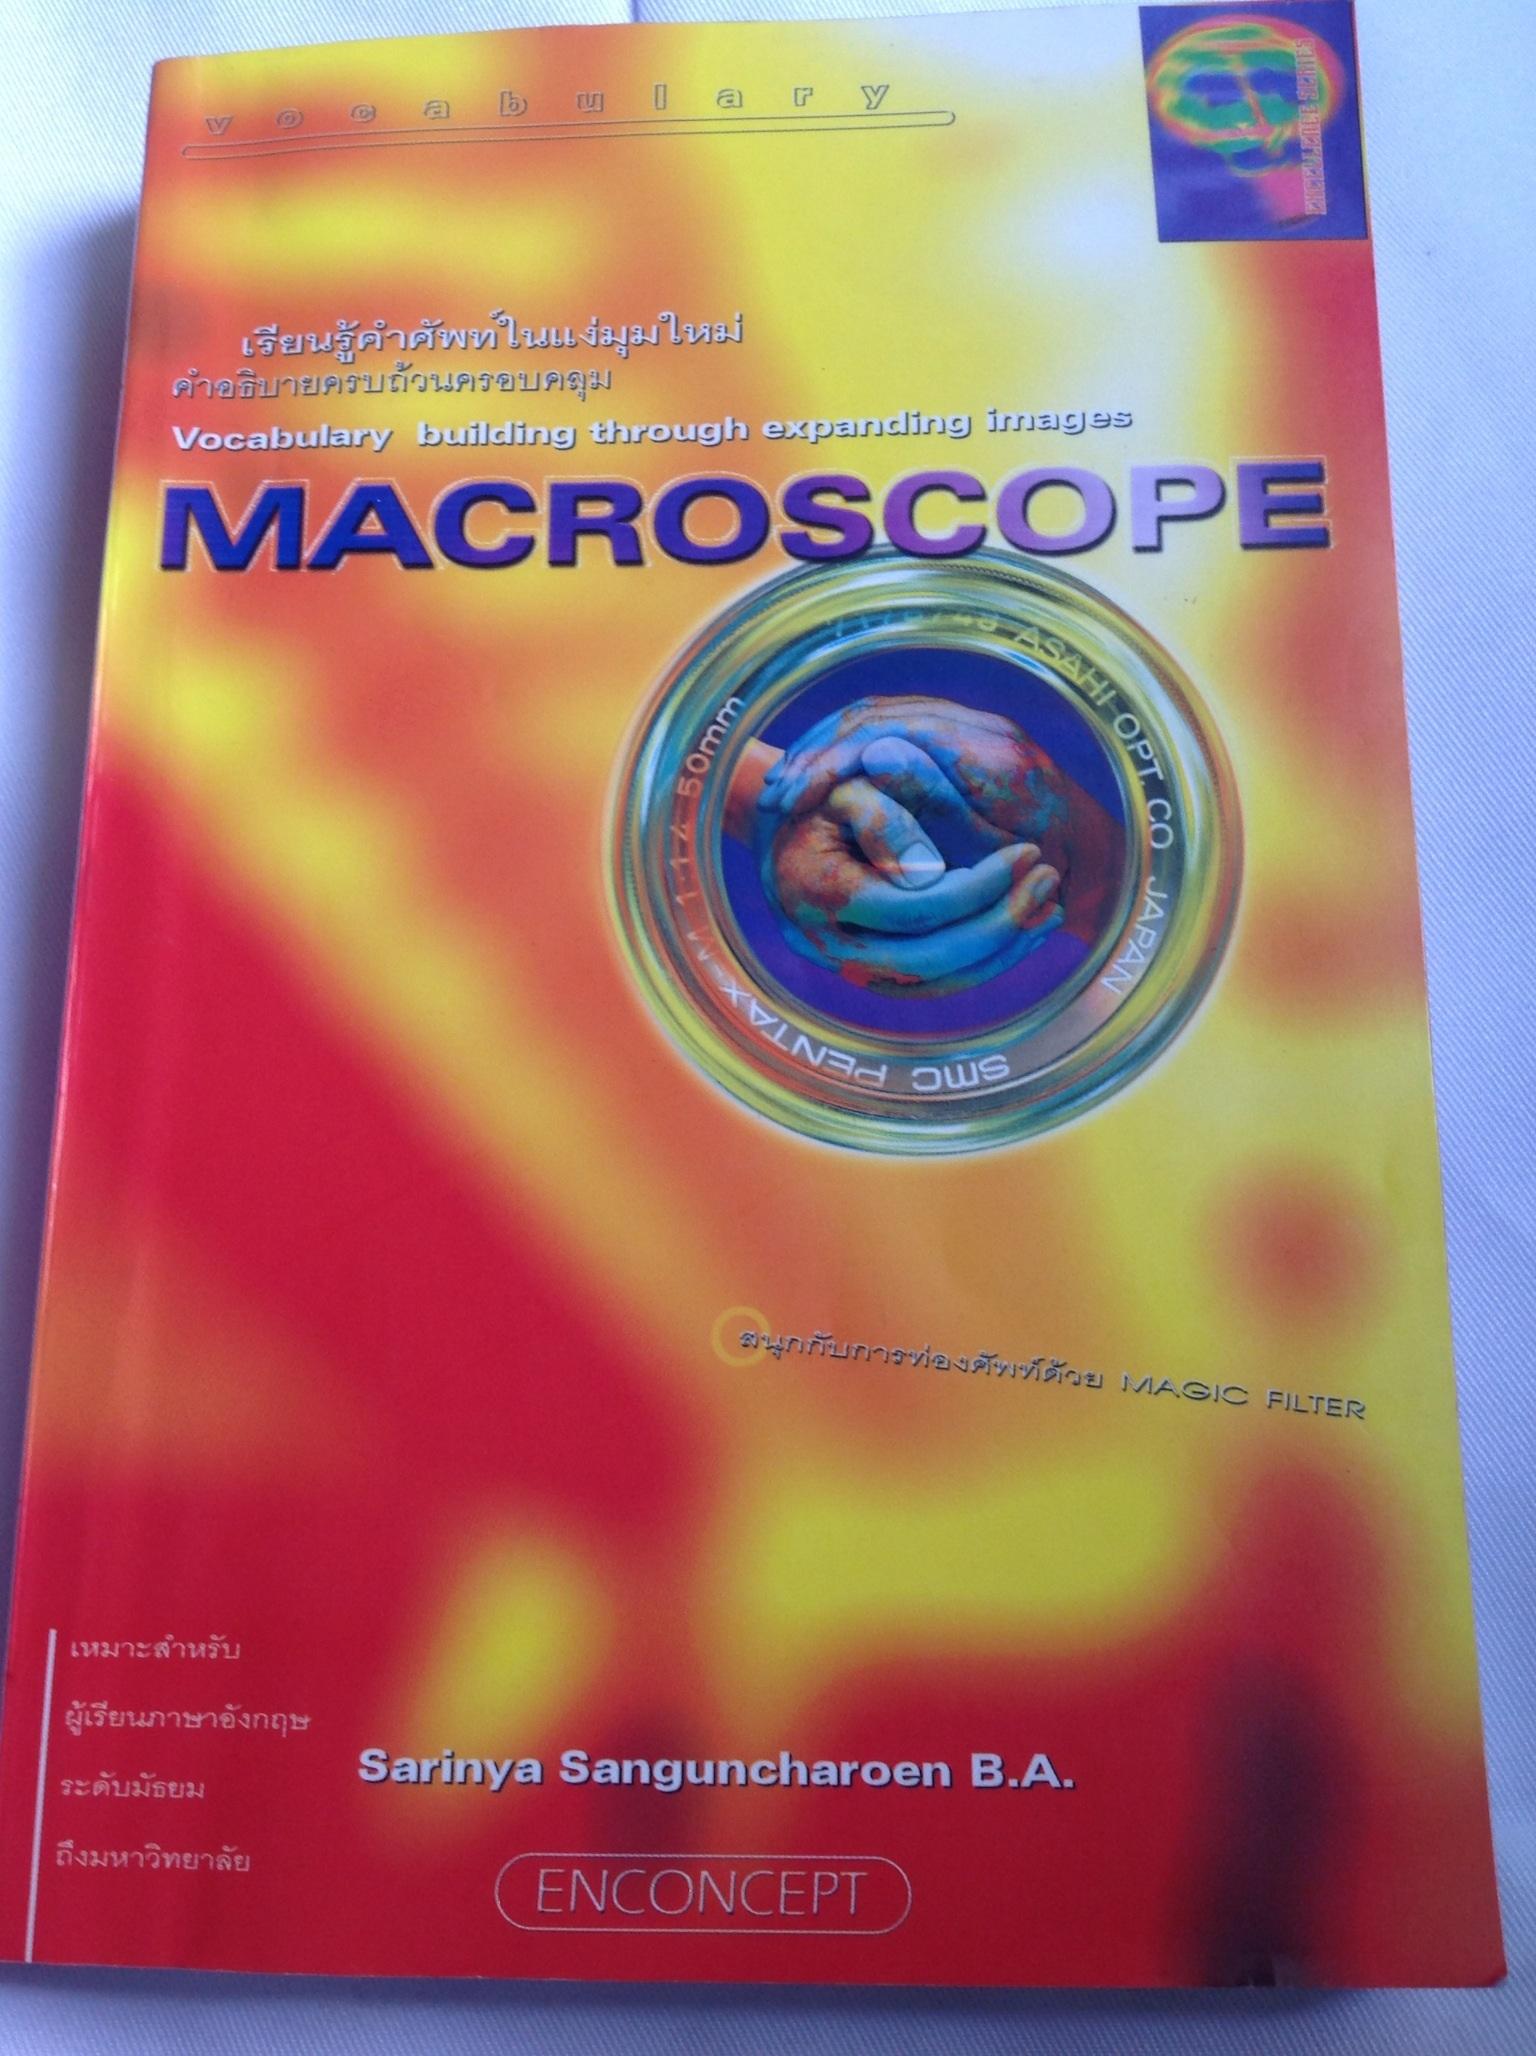 Macroscope เรียนรู้คำศัพท์ในแง่มุมใหม่